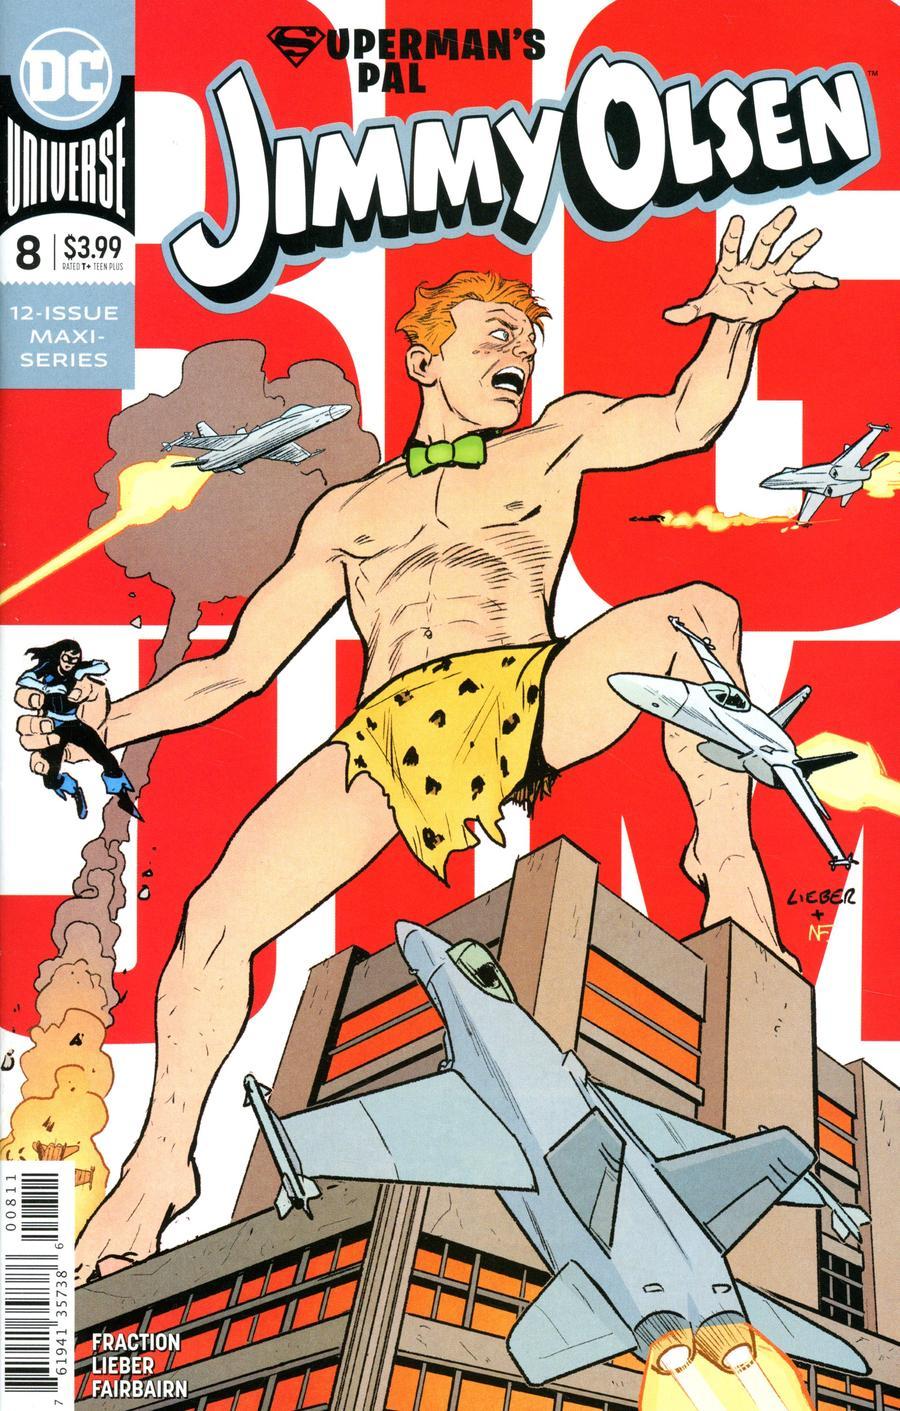 Supermans Pal Jimmy Olsen Vol 2 #8 Cover A Regular Steve Lieber Cover